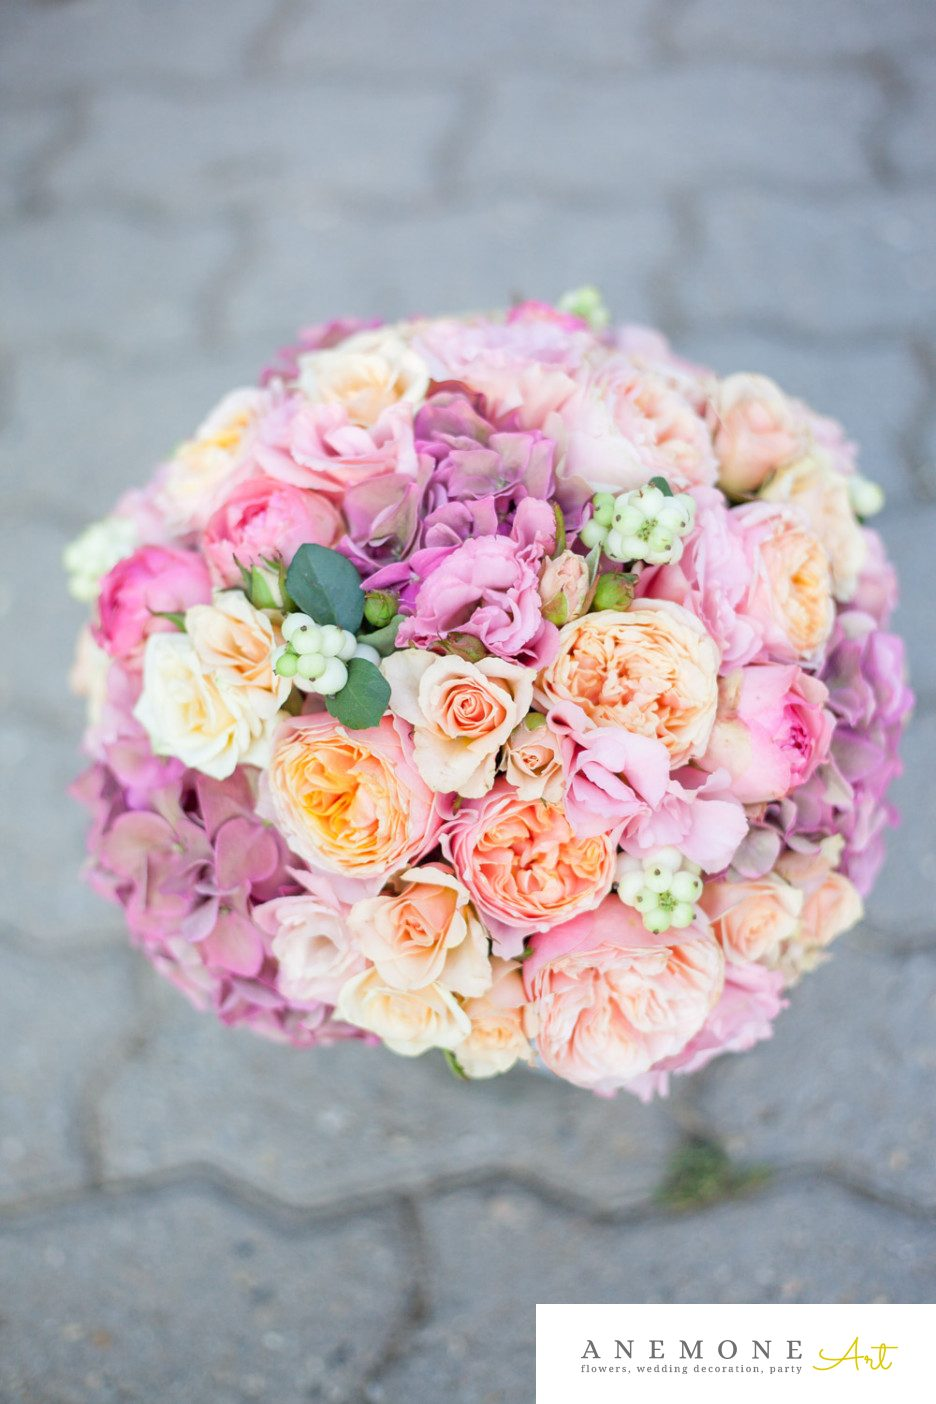 Poza, foto cu Flori de nunta buchet mireasa, hortensia, piersica, roz, trandafiri in Arad, Timisoara, Oradea (wedding flowers, bouquets) nunta Arad, Timisoara, Oradea